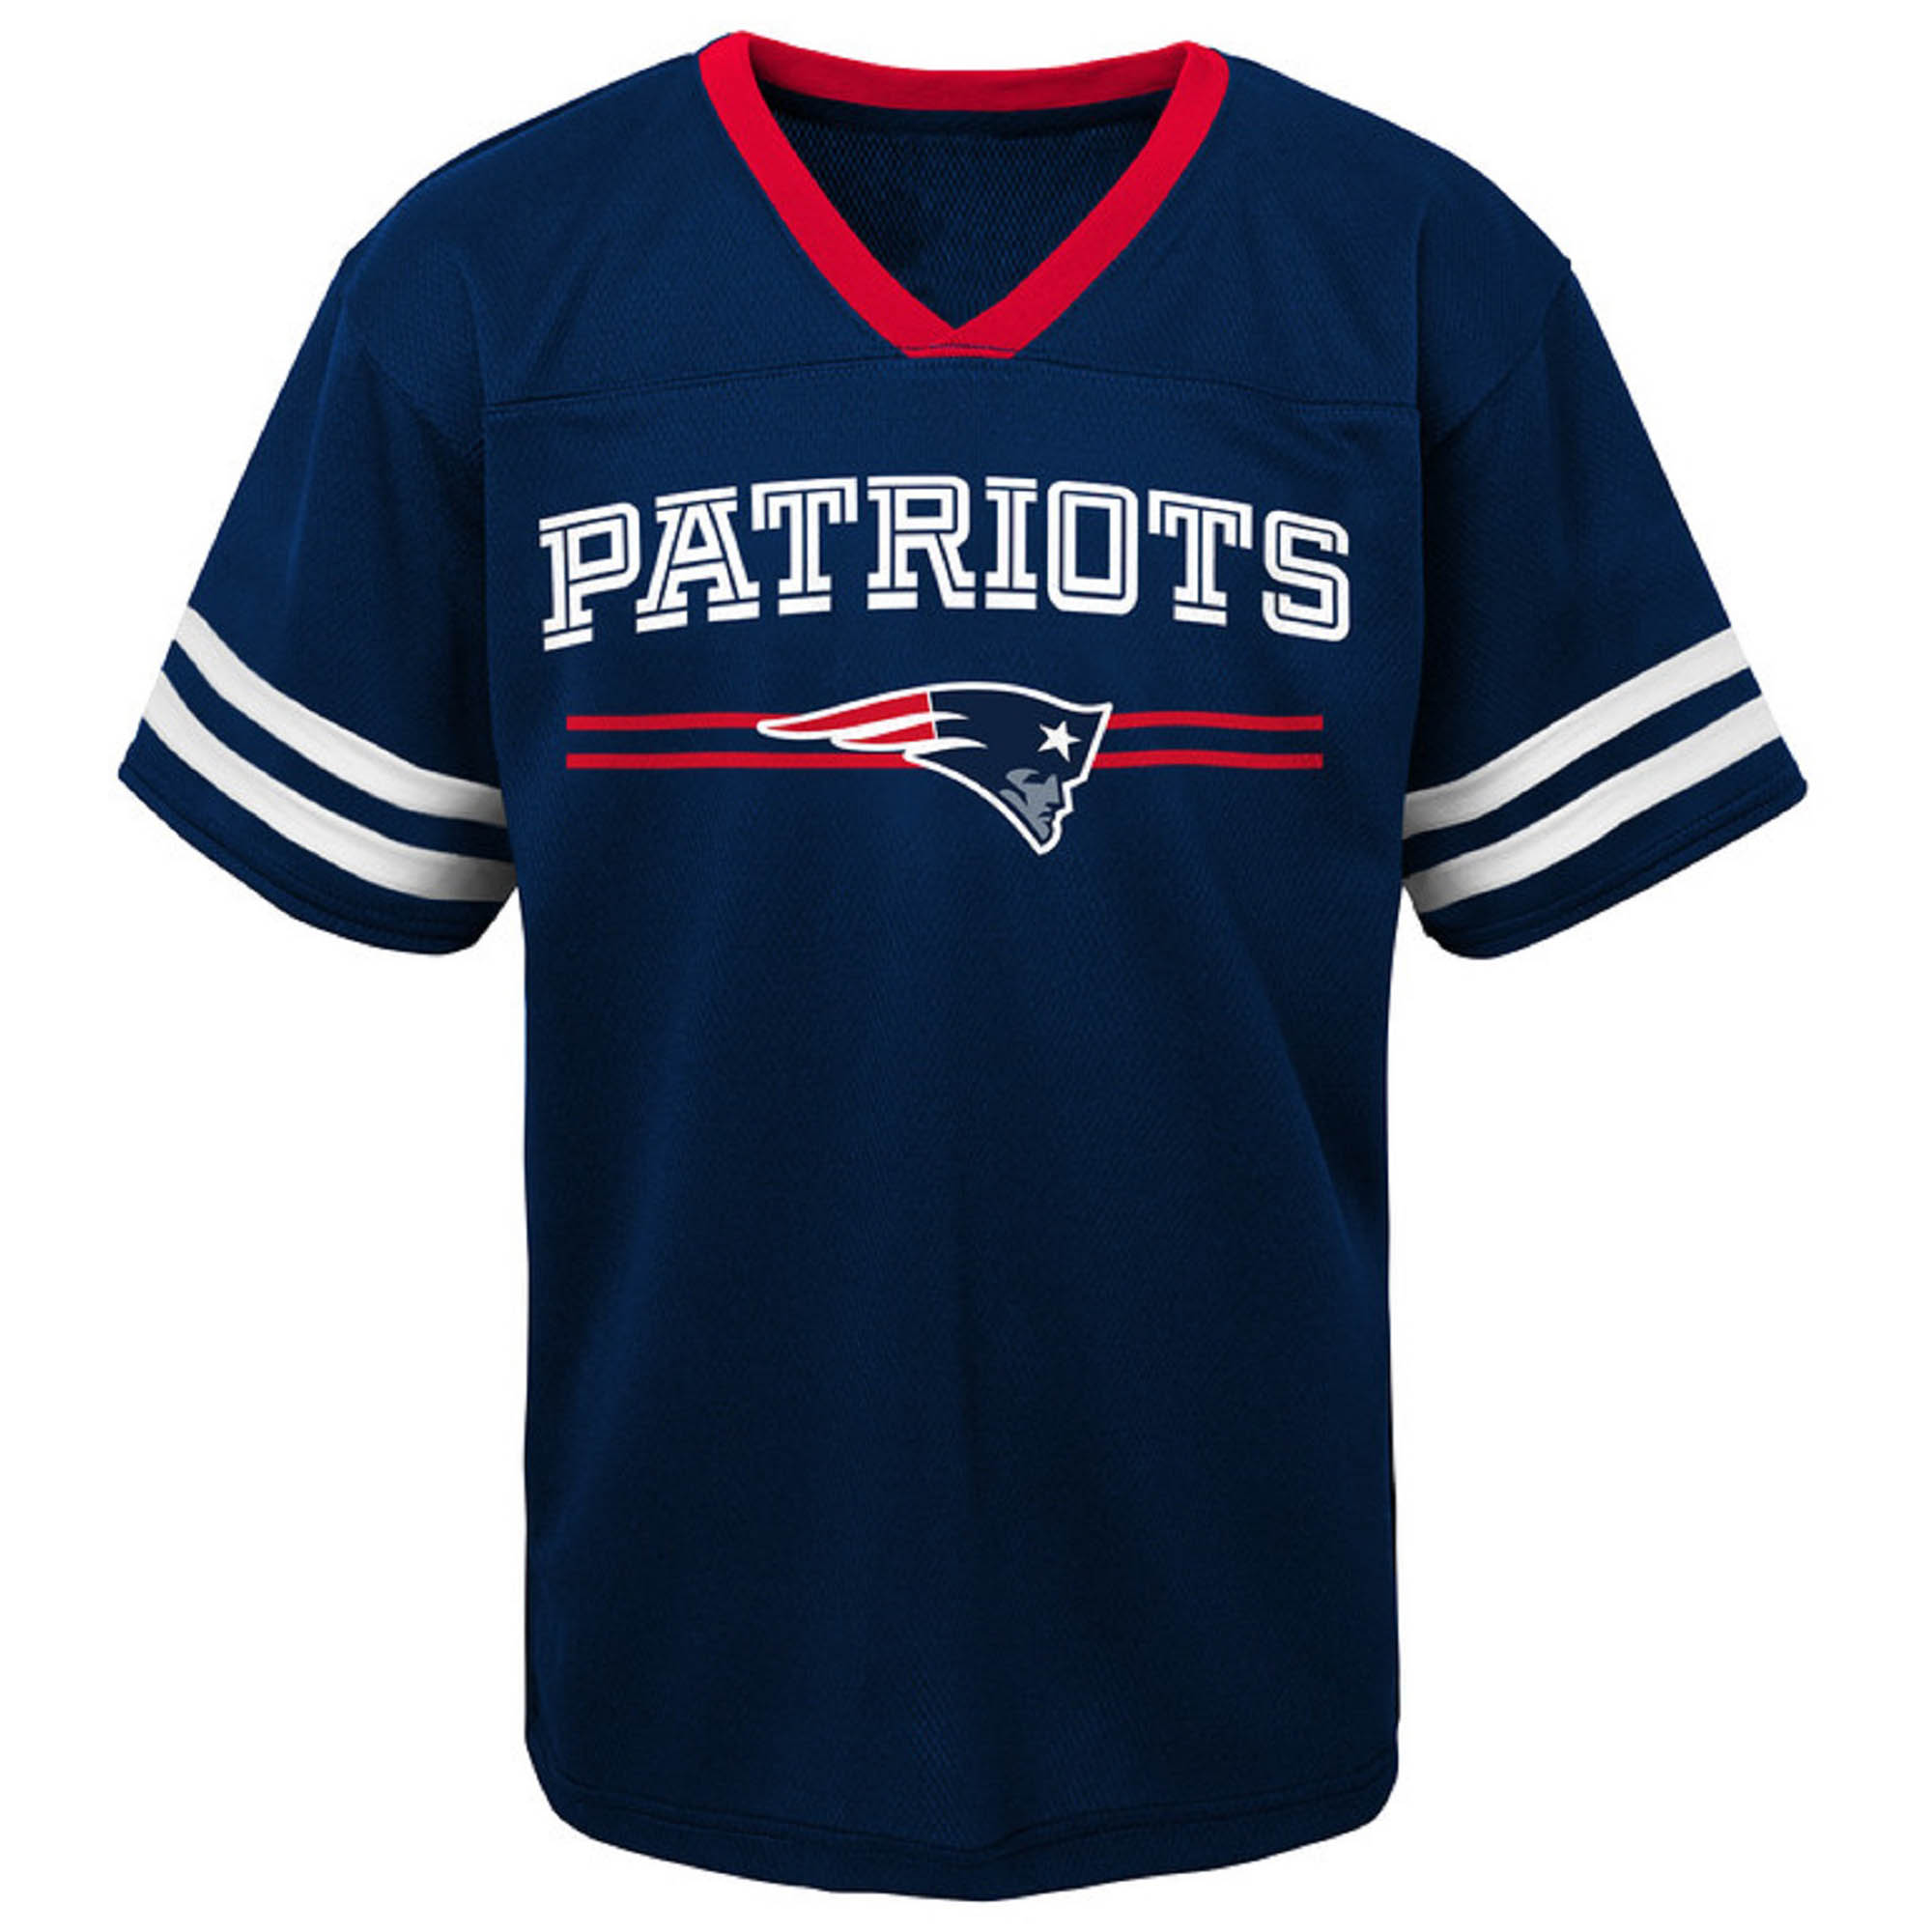 Toddler Navy New England Patriots Mesh Jersey V-Neck T-Shirt